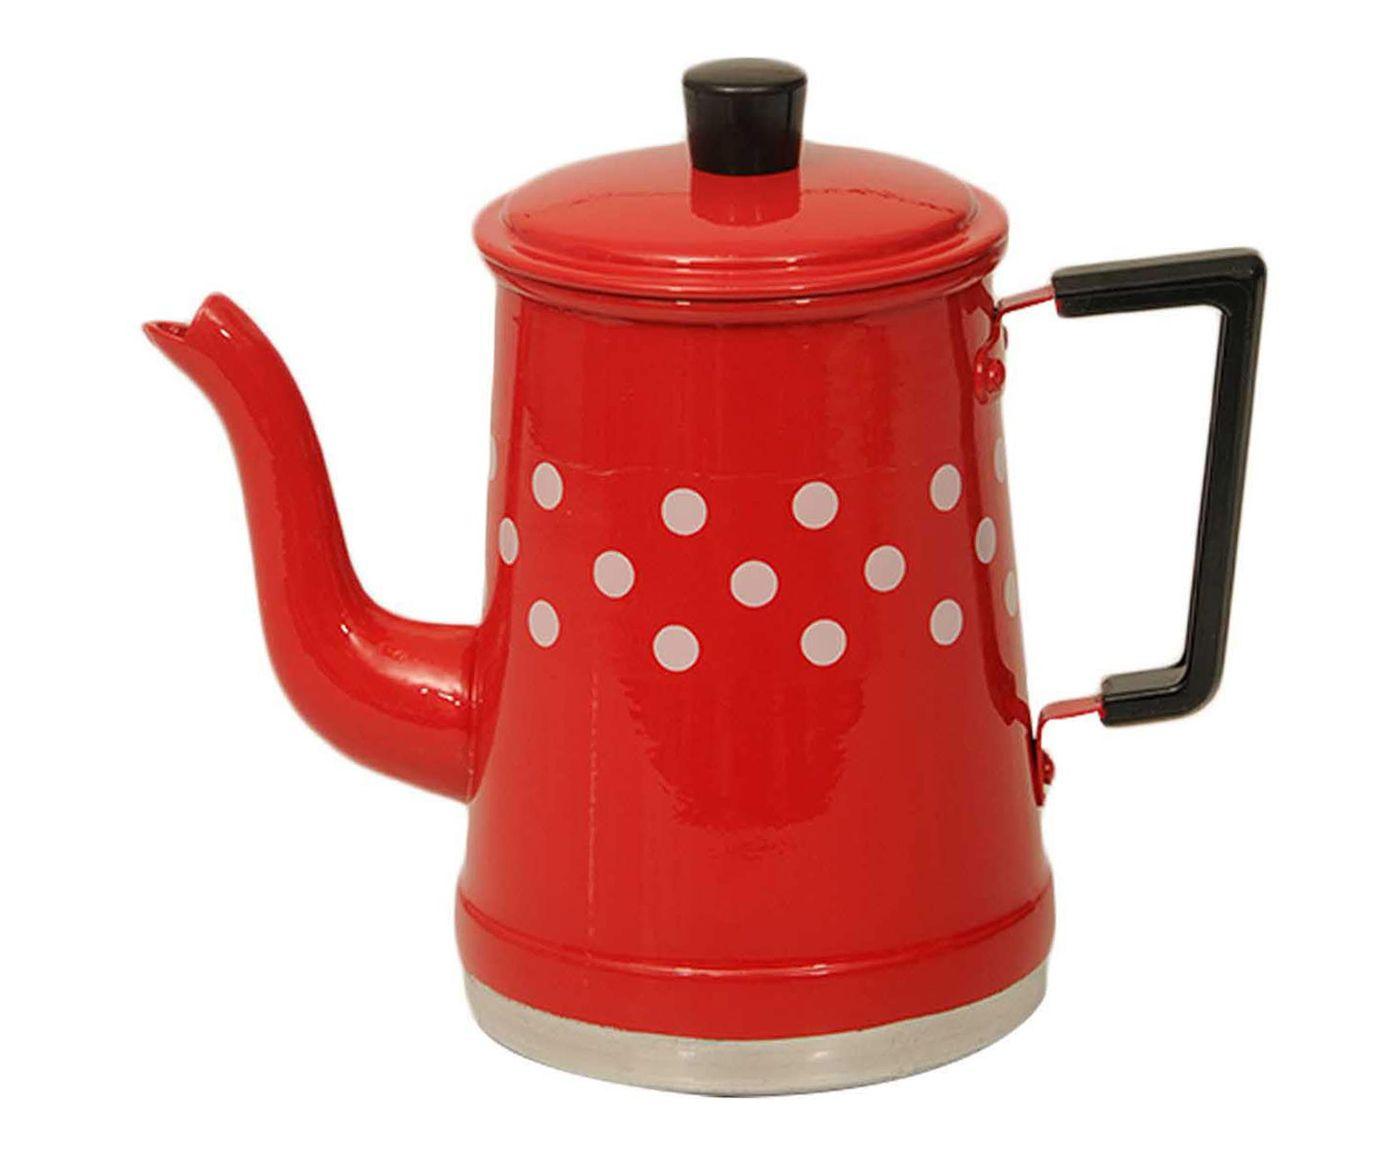 Bule Polka Dots Vermelho e Branco - 1L | Westwing.com.br